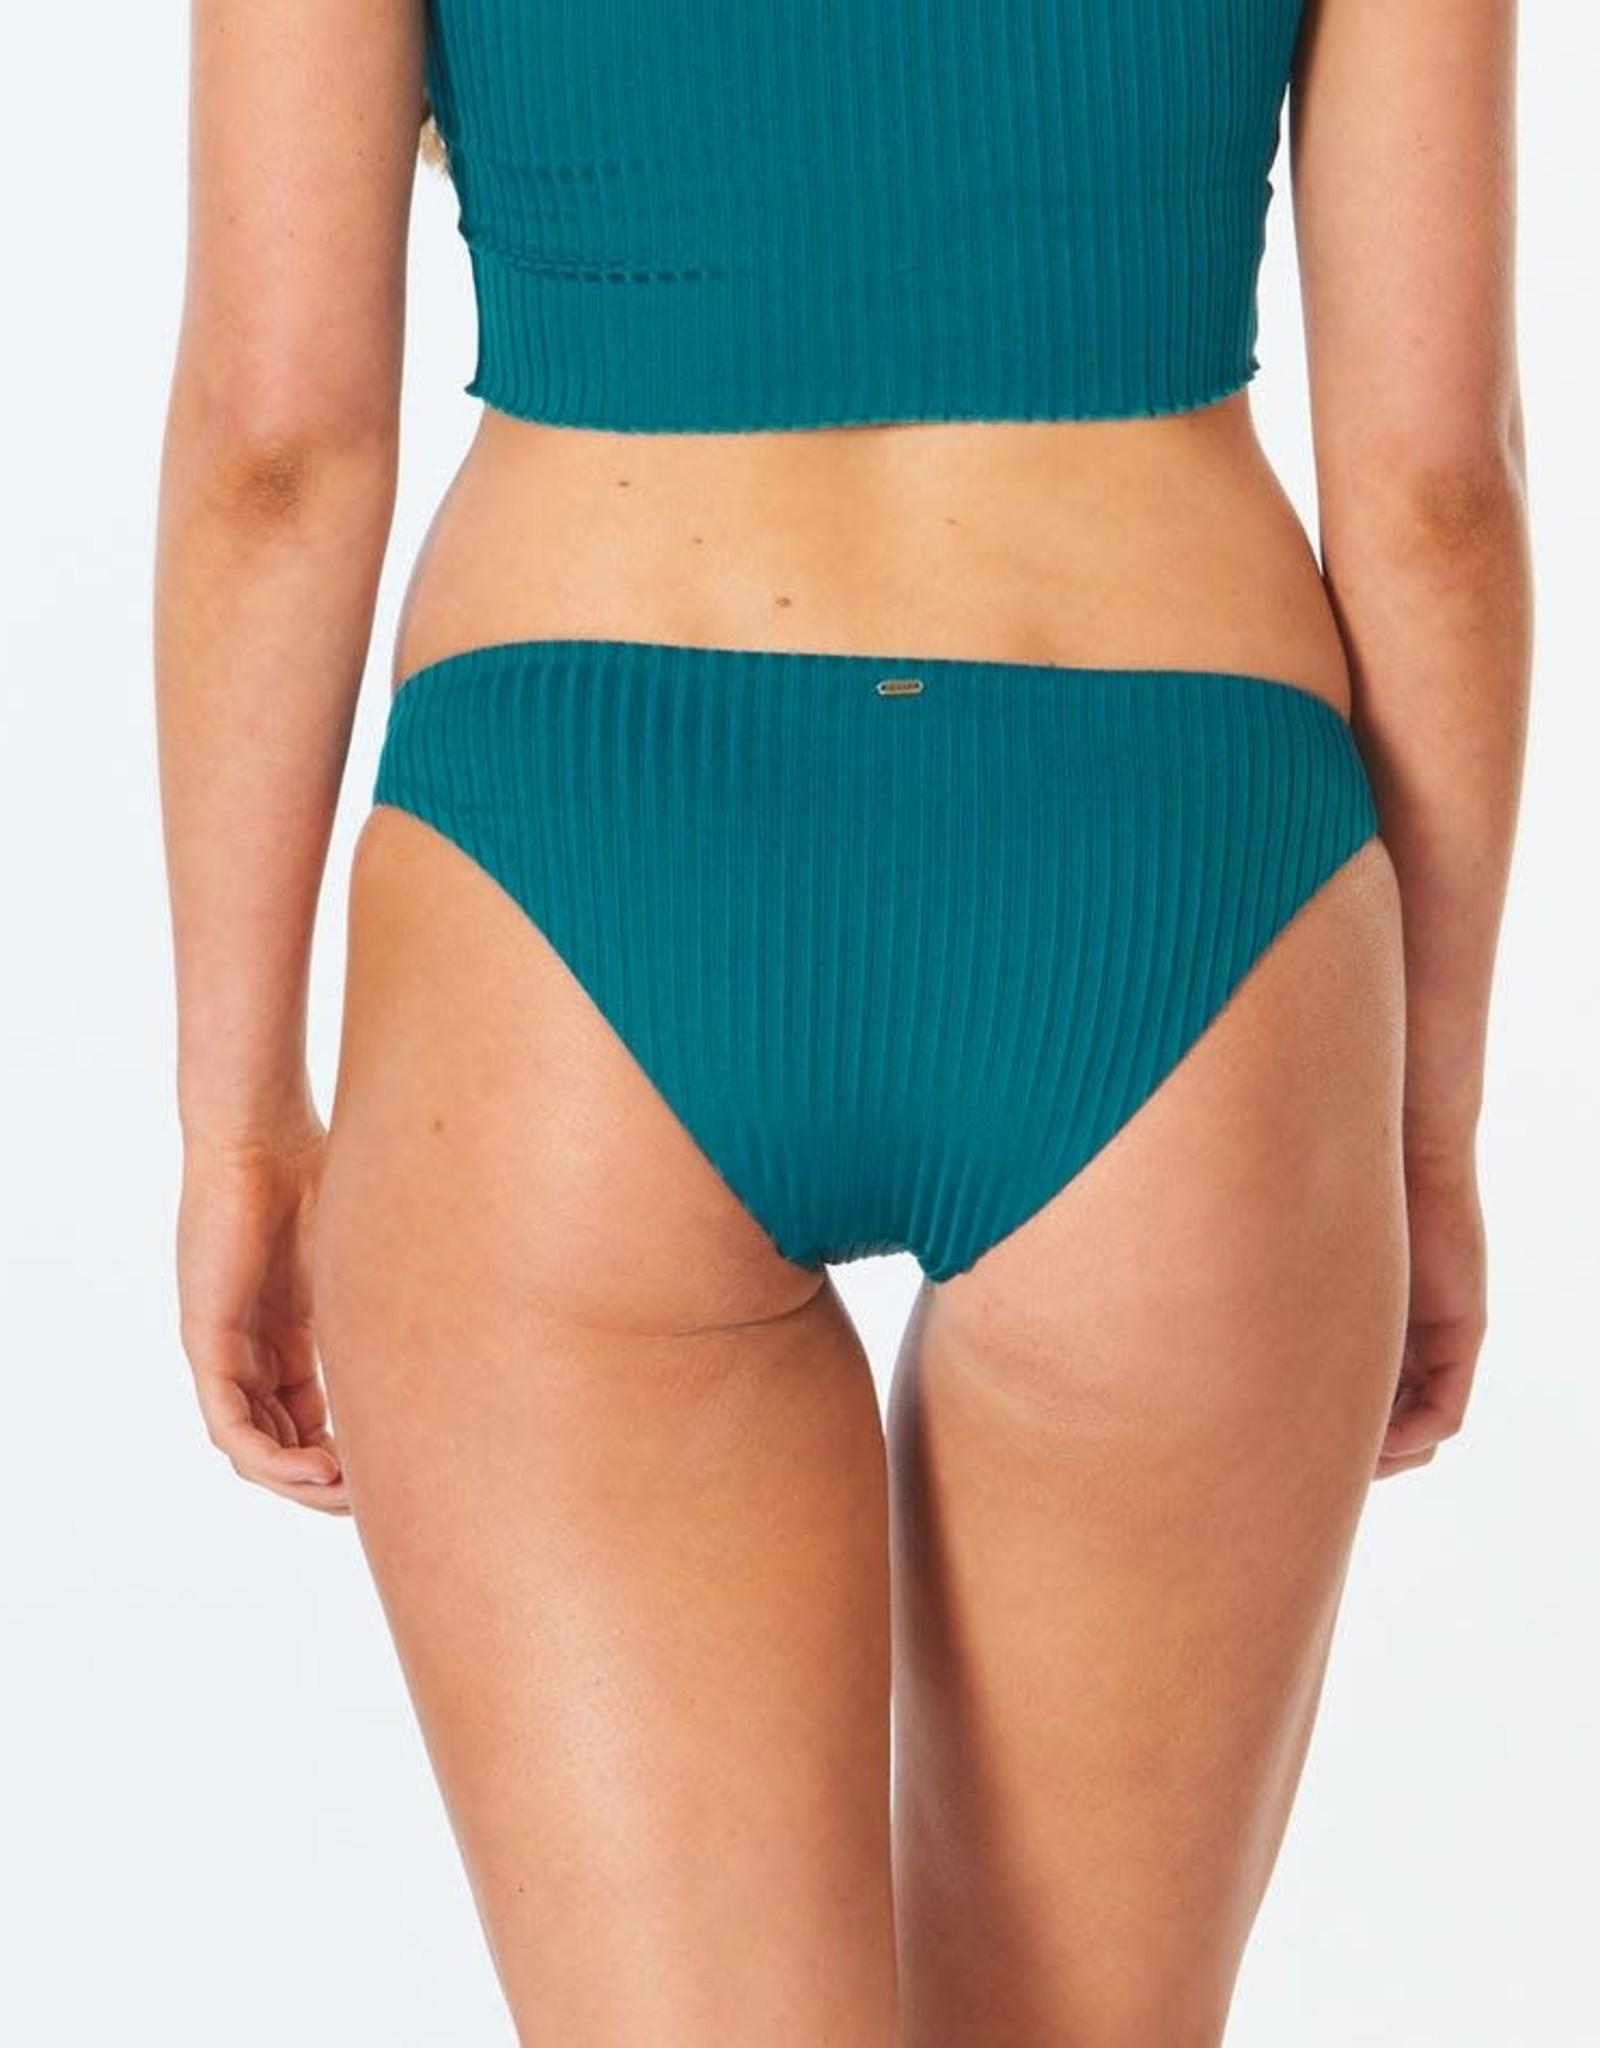 RIP CURL Premium Surf Cheeky Bikini Bottom